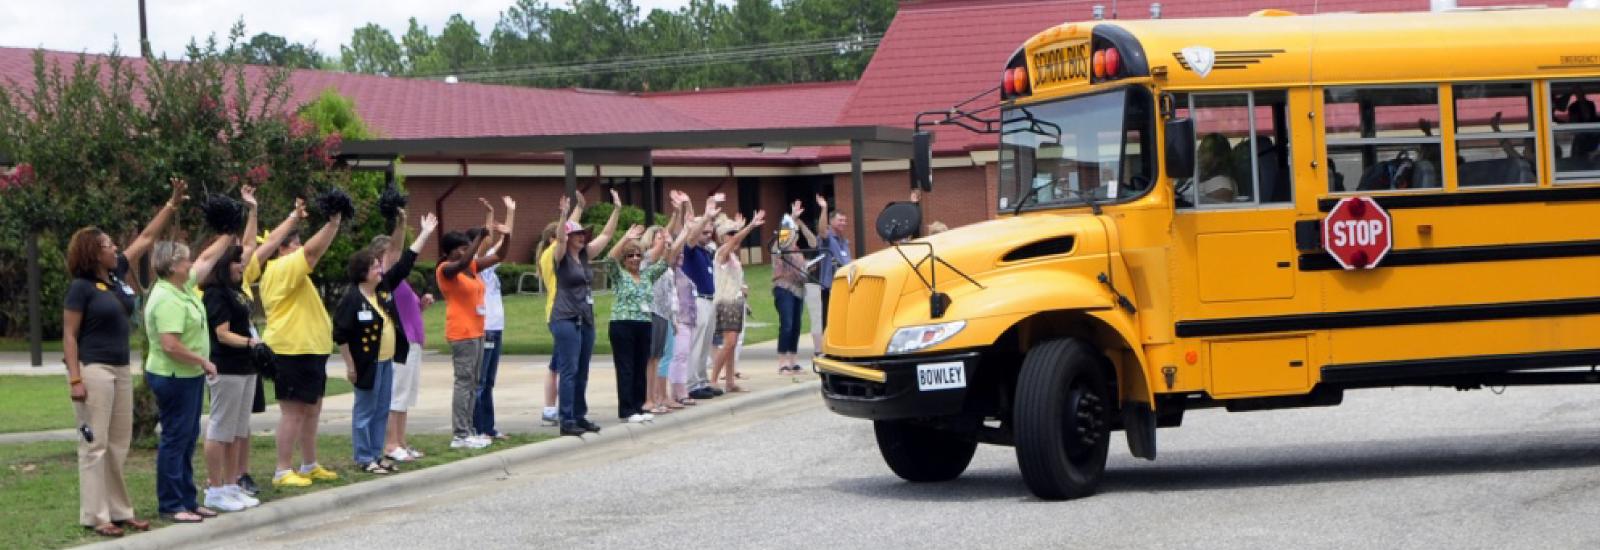 Schools Fort Bragg NC